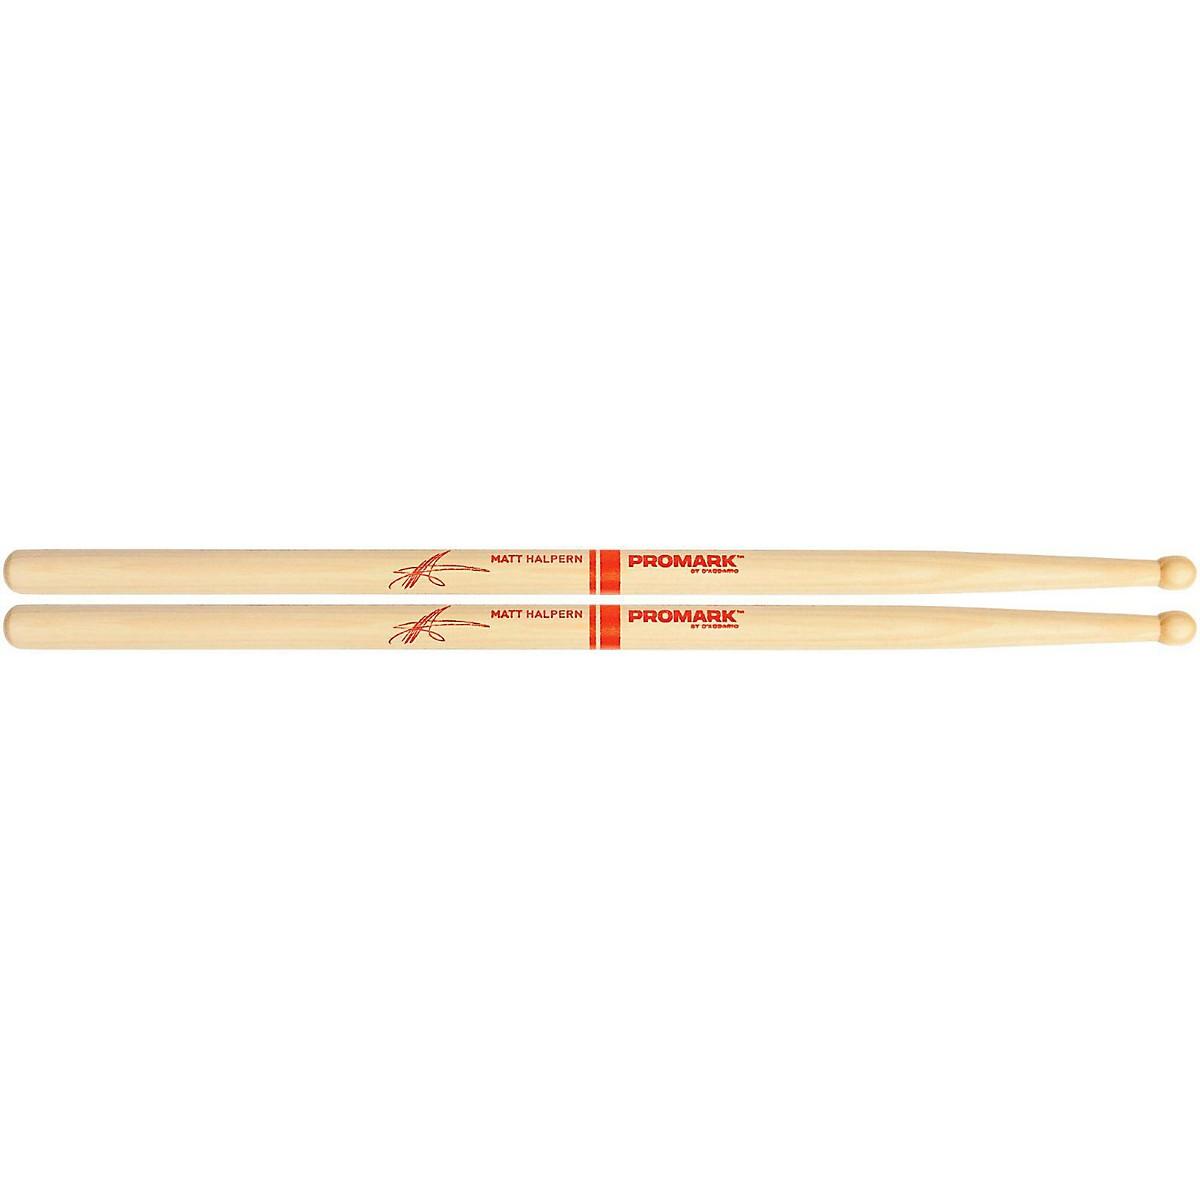 Promark Matt Halpern Signature Drumstick